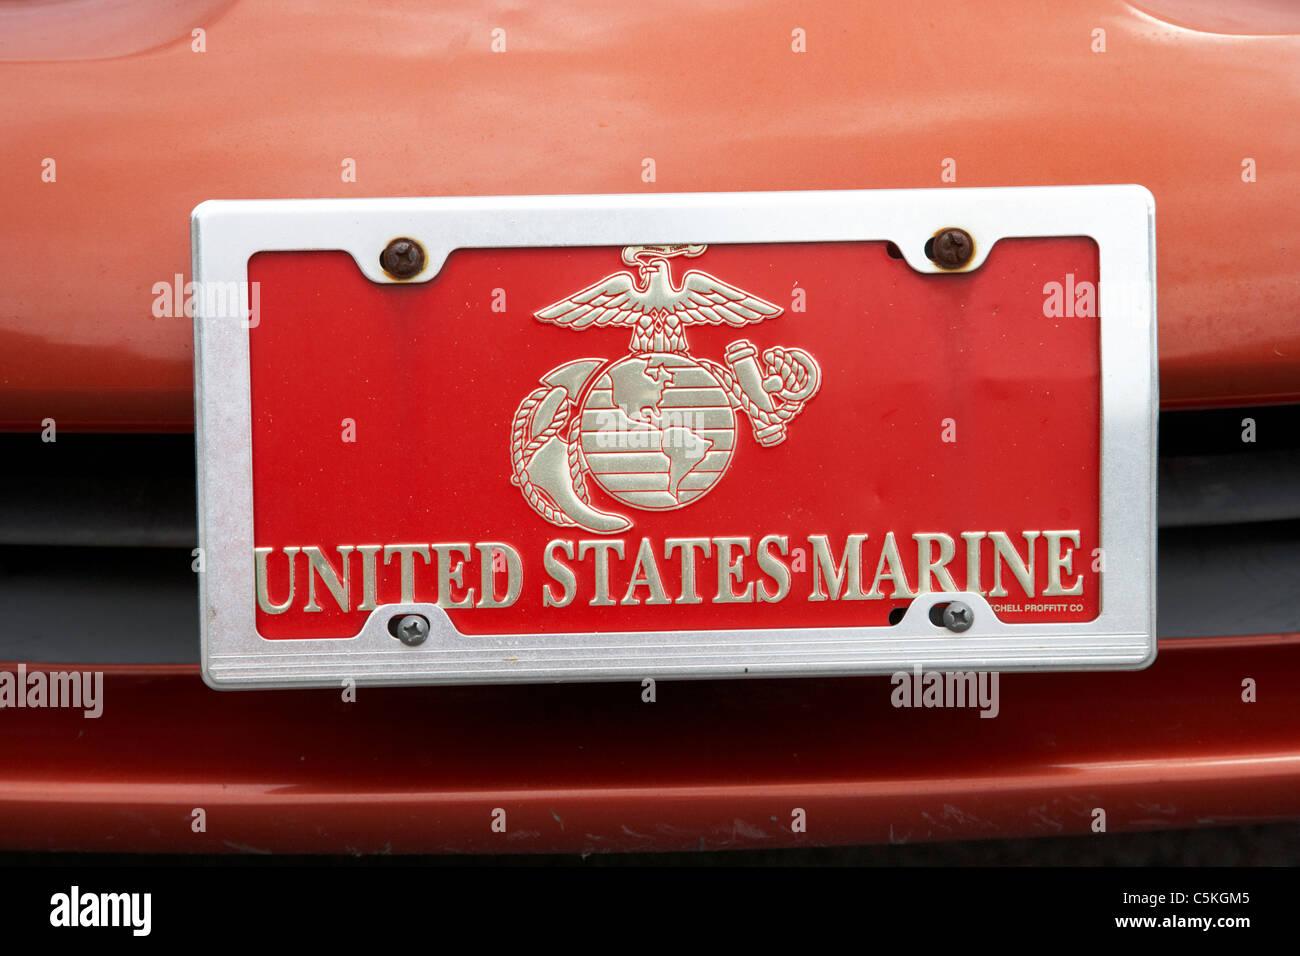 United States Marines Stockfotos & United States Marines Bilder - Alamy